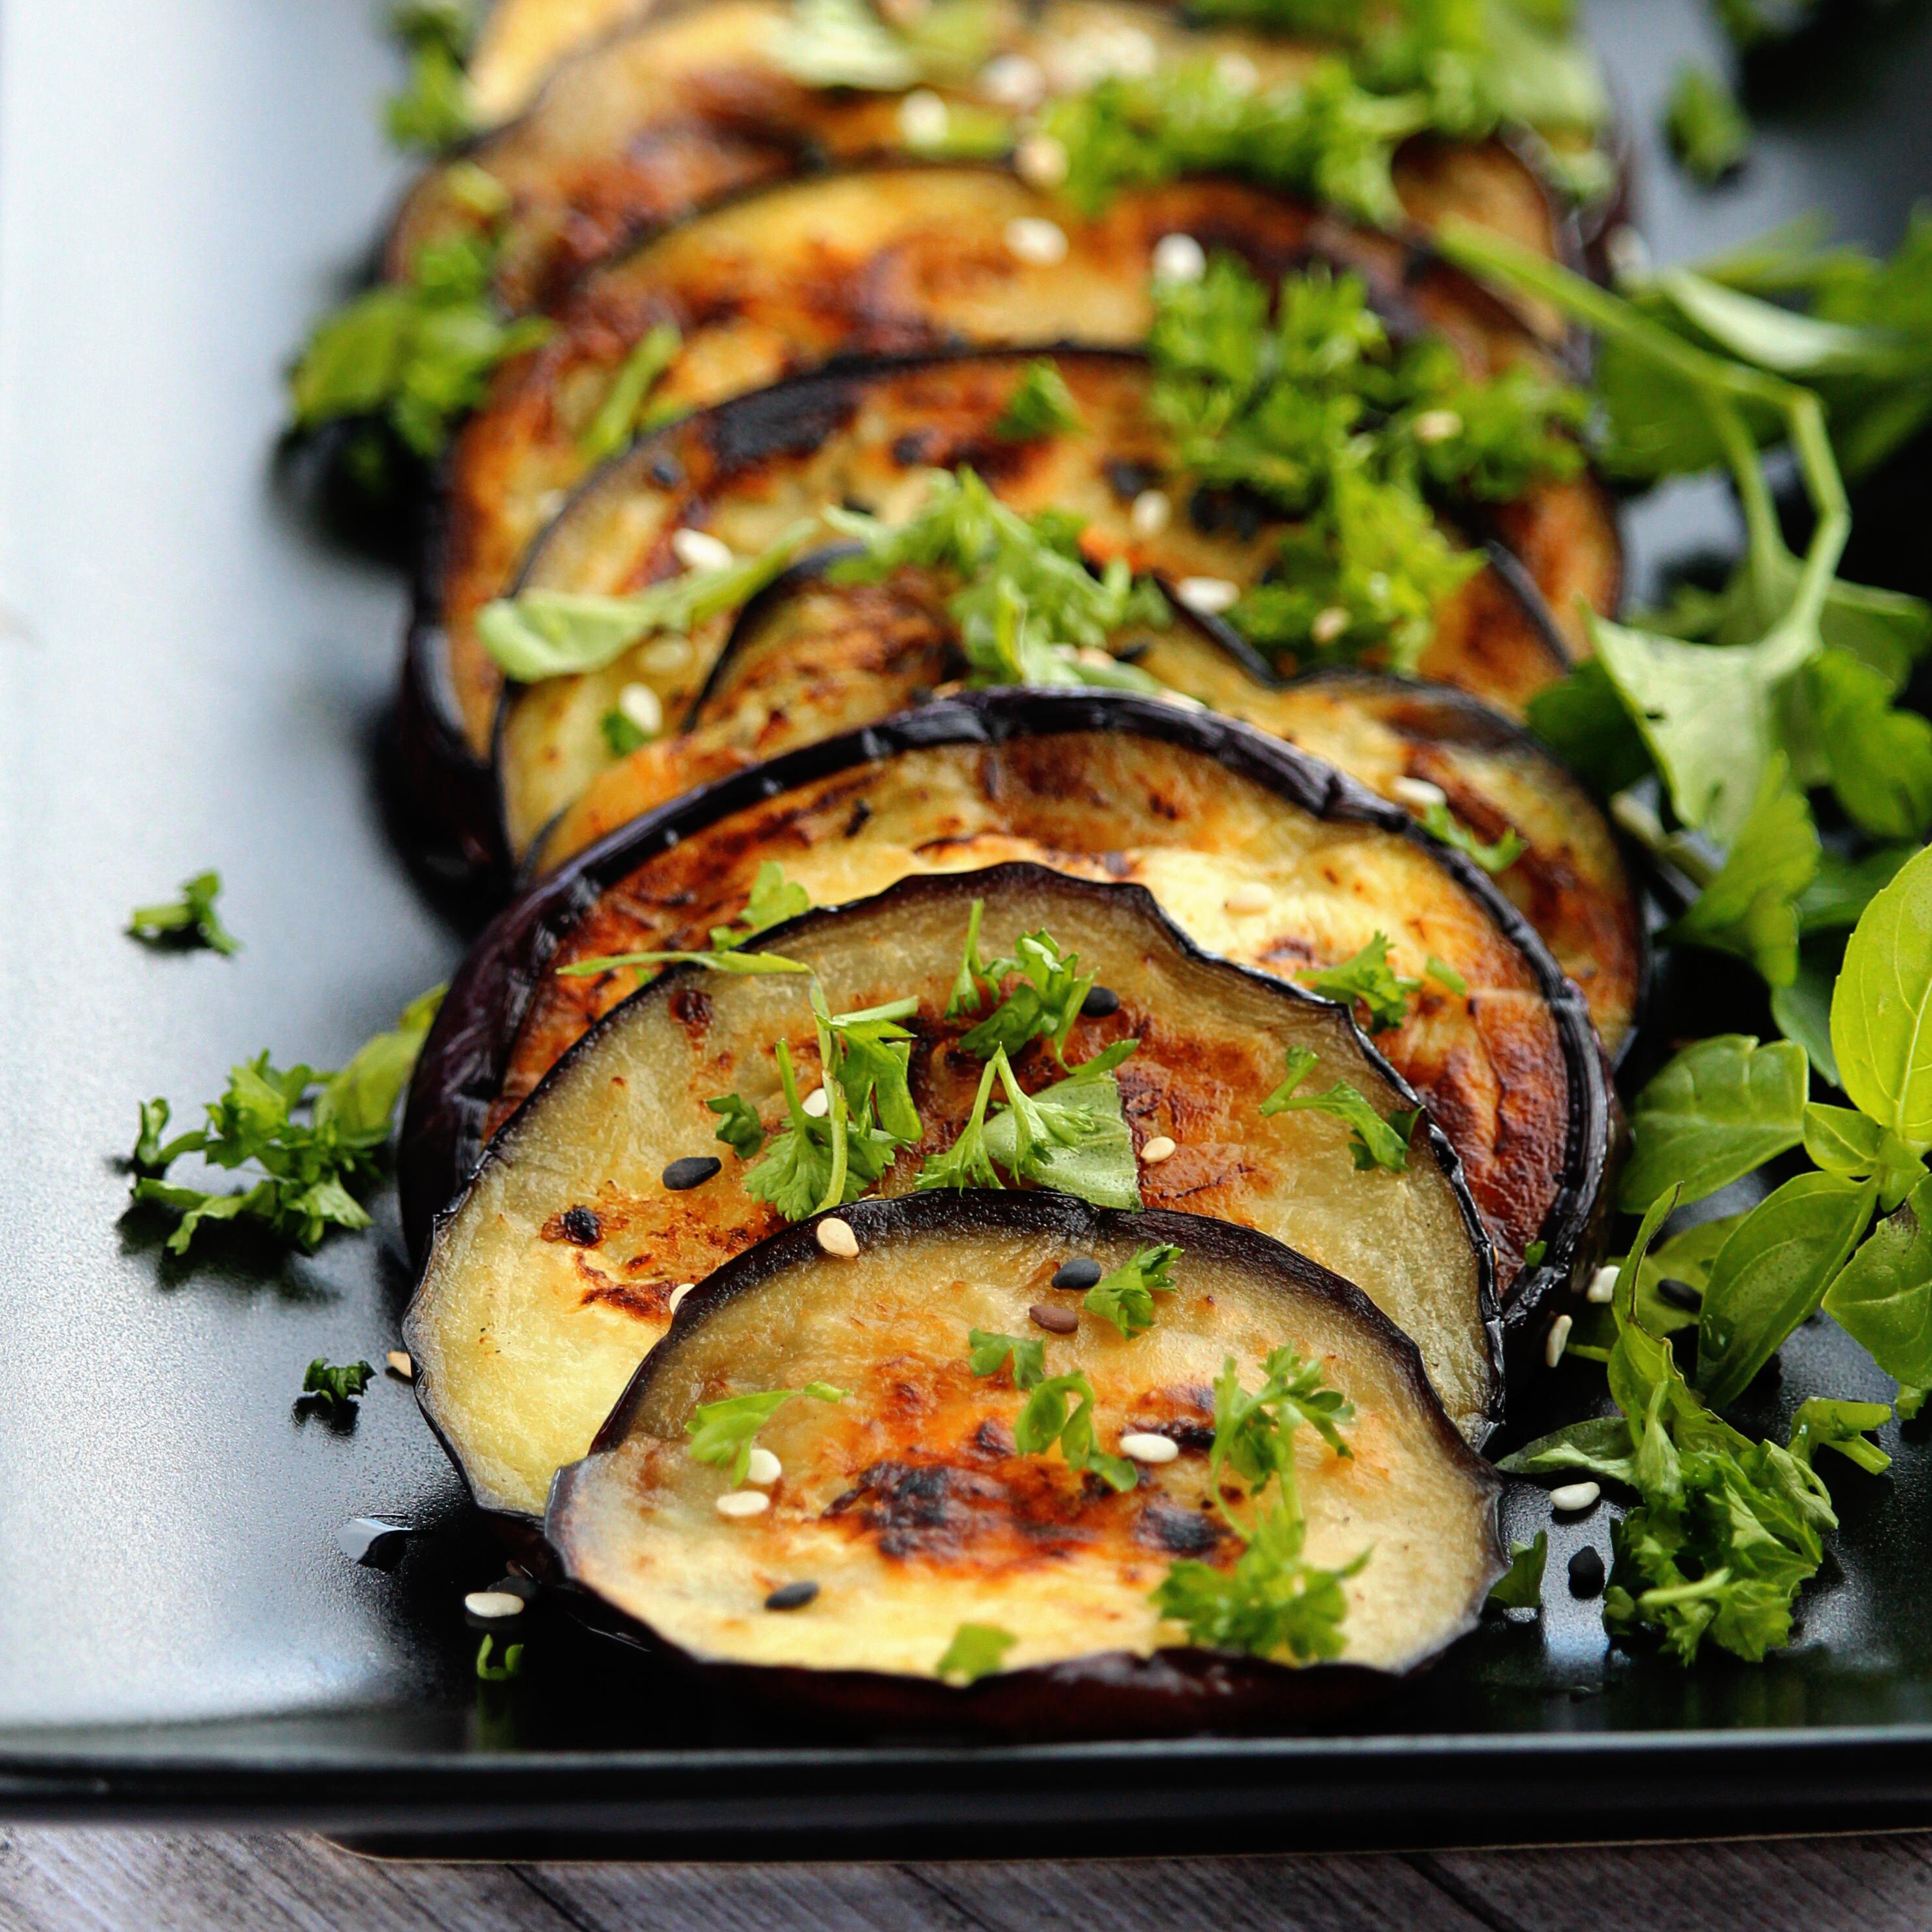 Italian Grilled Eggplant with Basil and Parsley (Melanzane Grigliate al Basilico e Prezzemolo) Buckwheat Queen